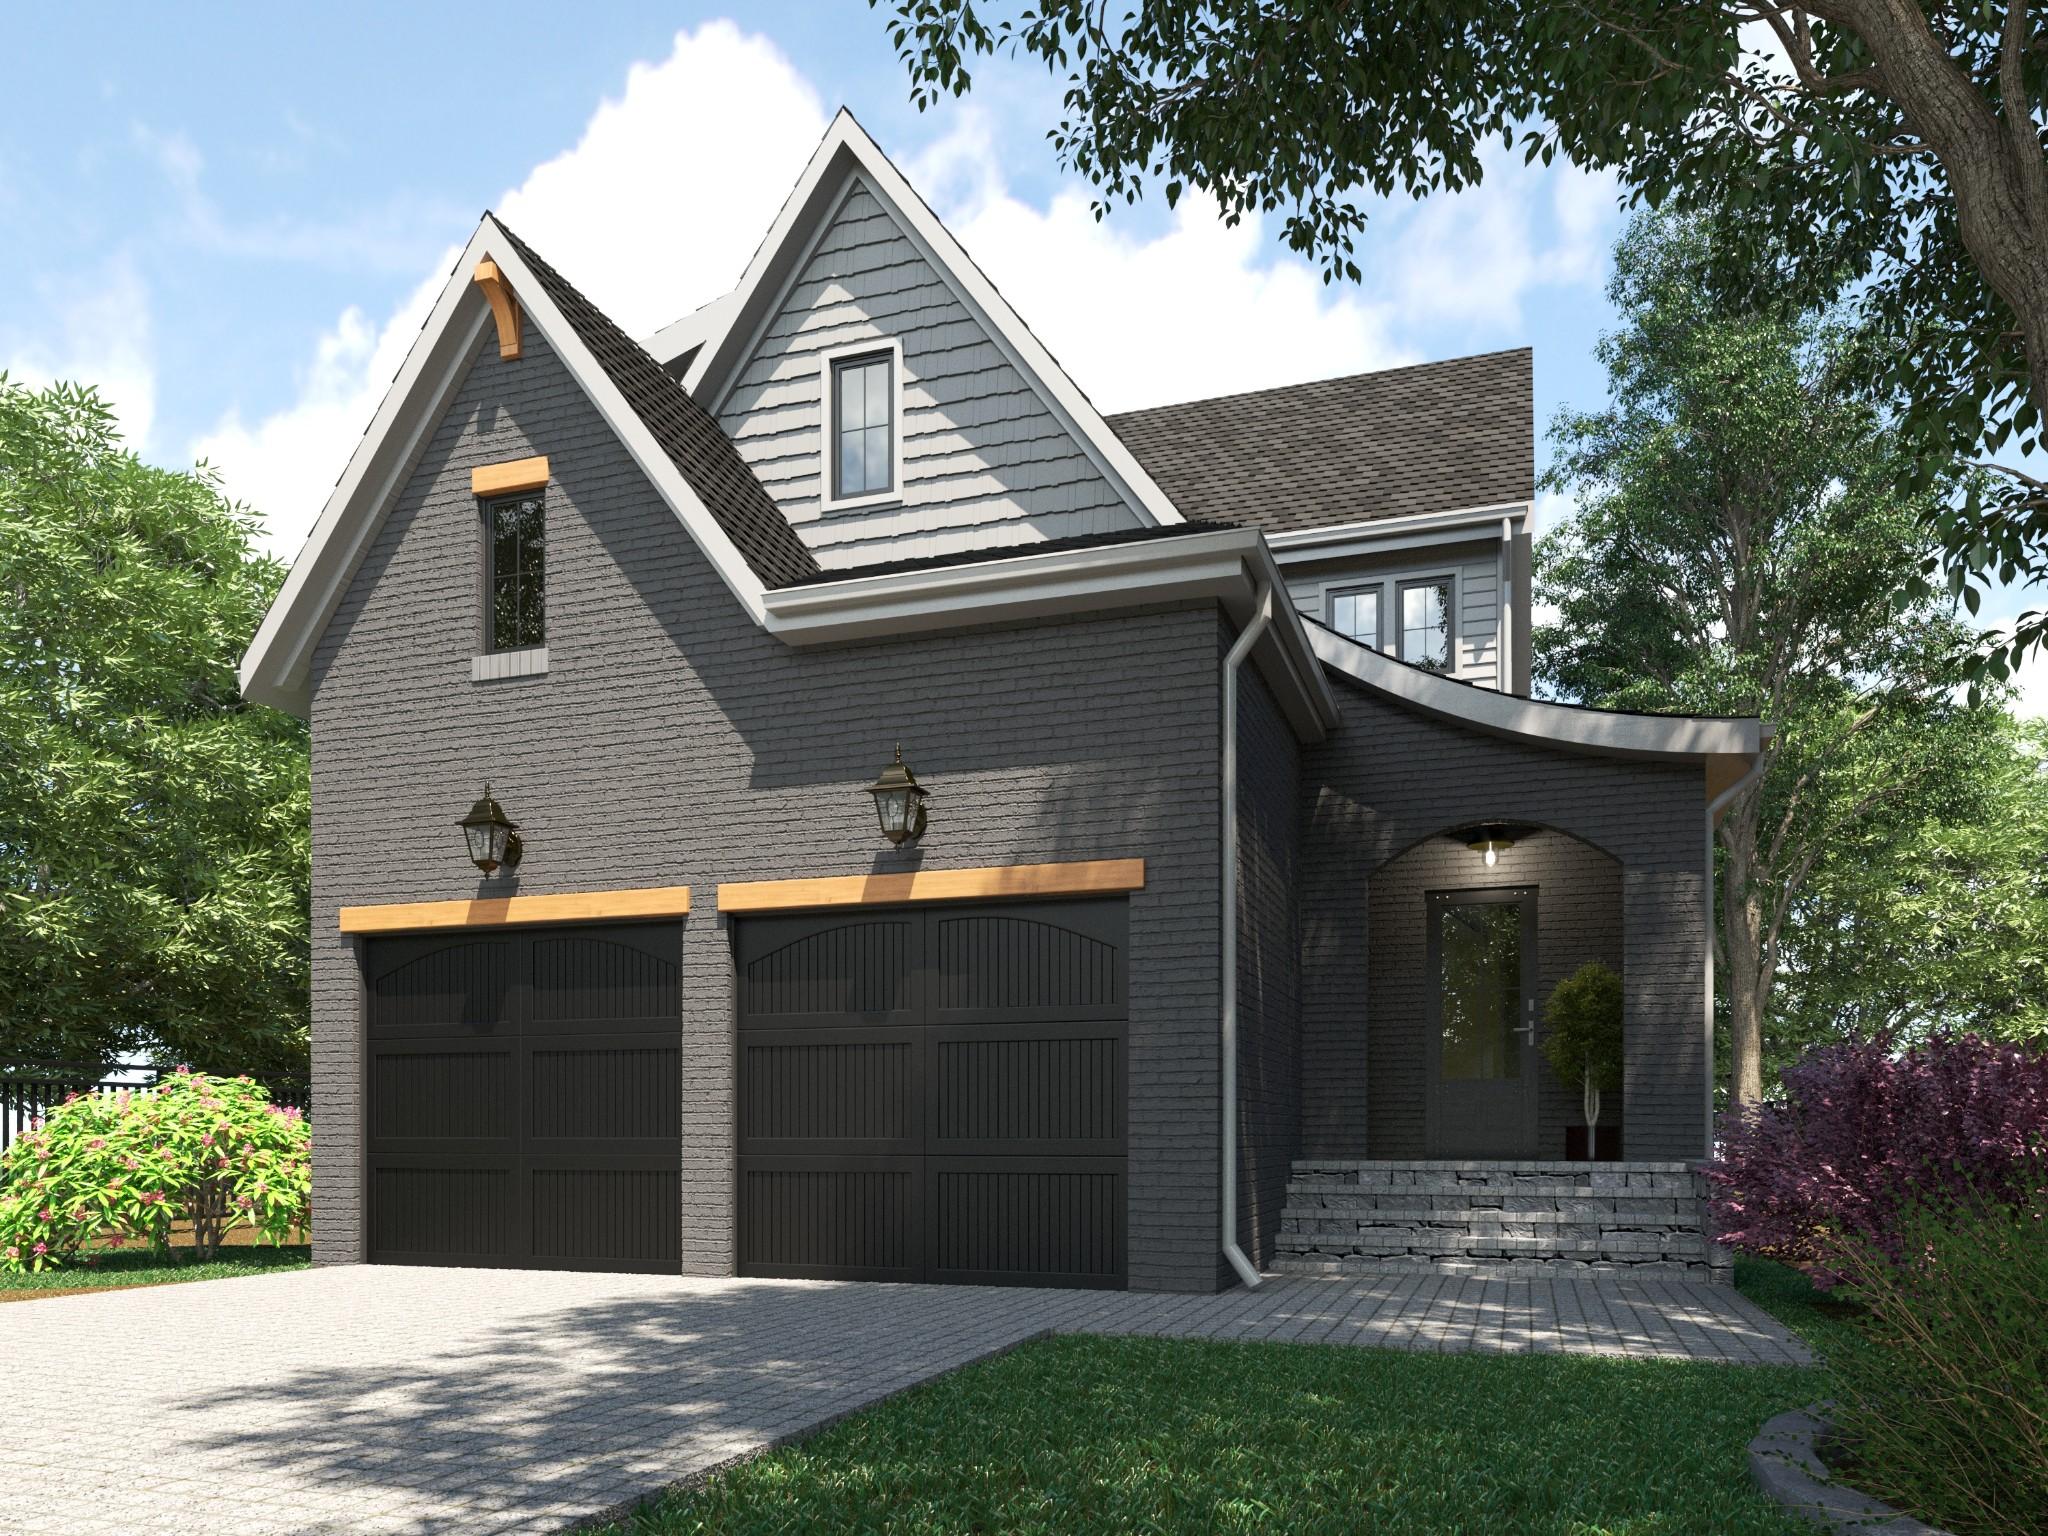 4018B Woodmont Blvd. Property Photo - Nashville, TN real estate listing